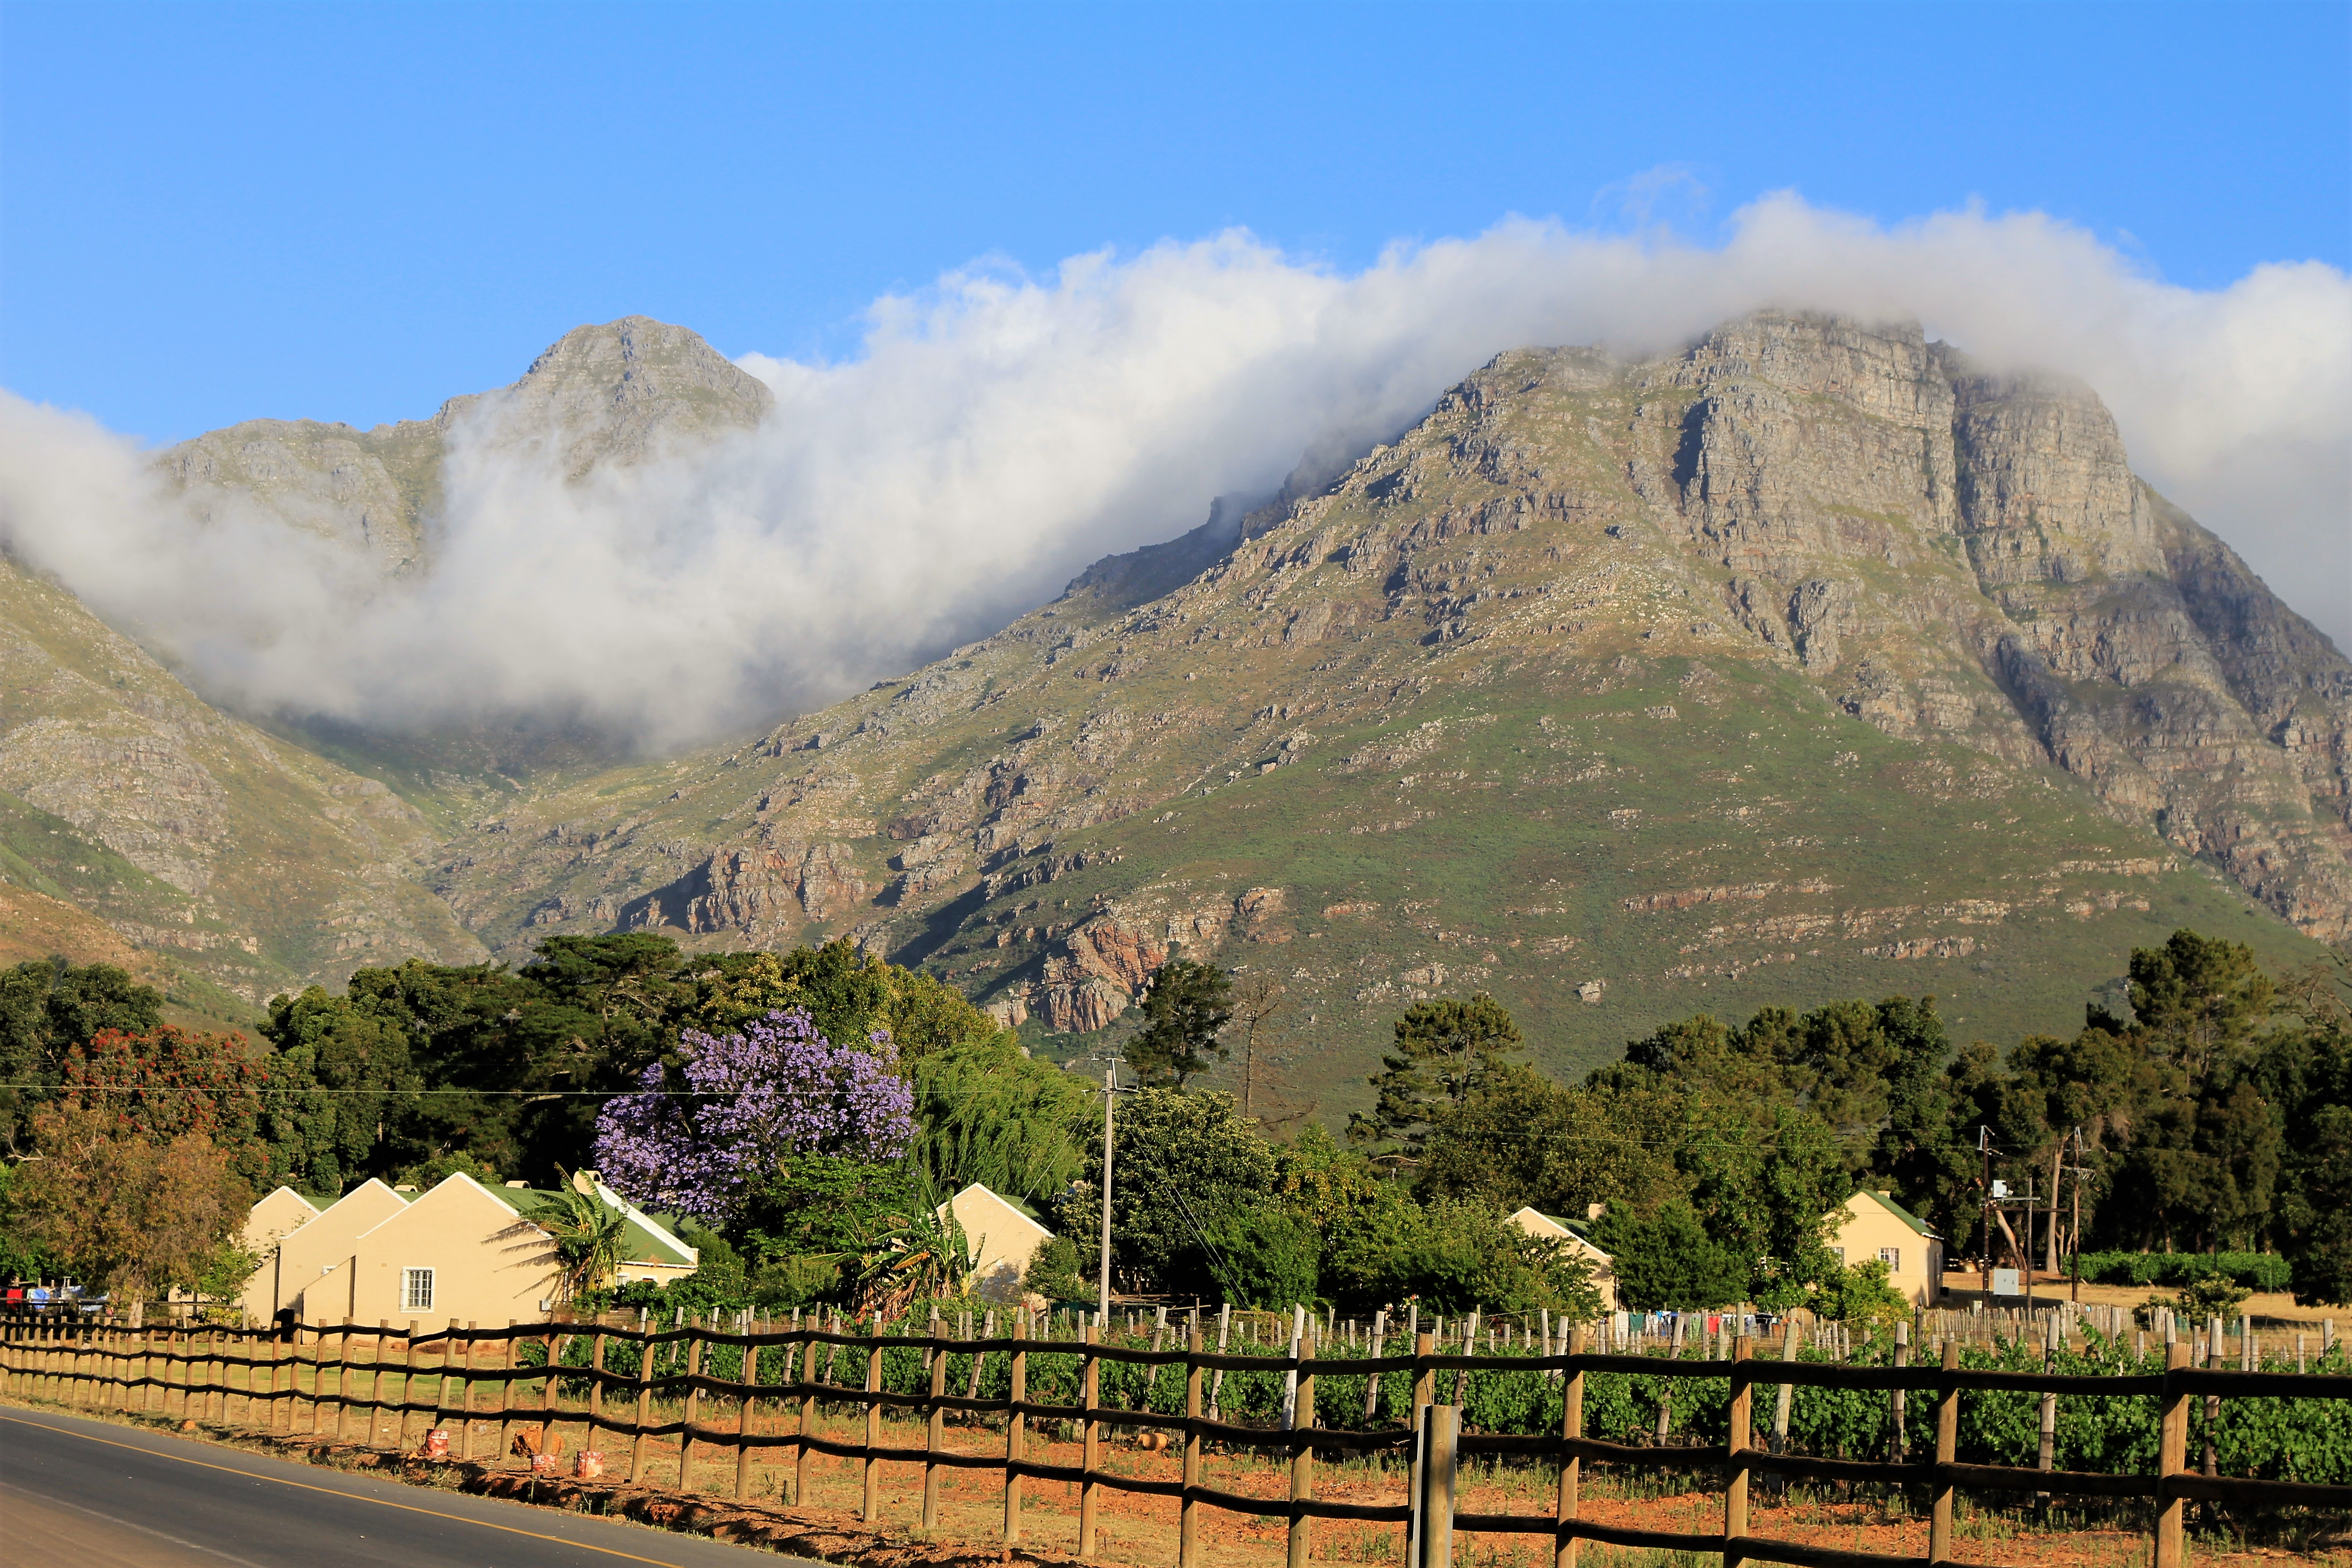 Views over the Stellenbosch vines